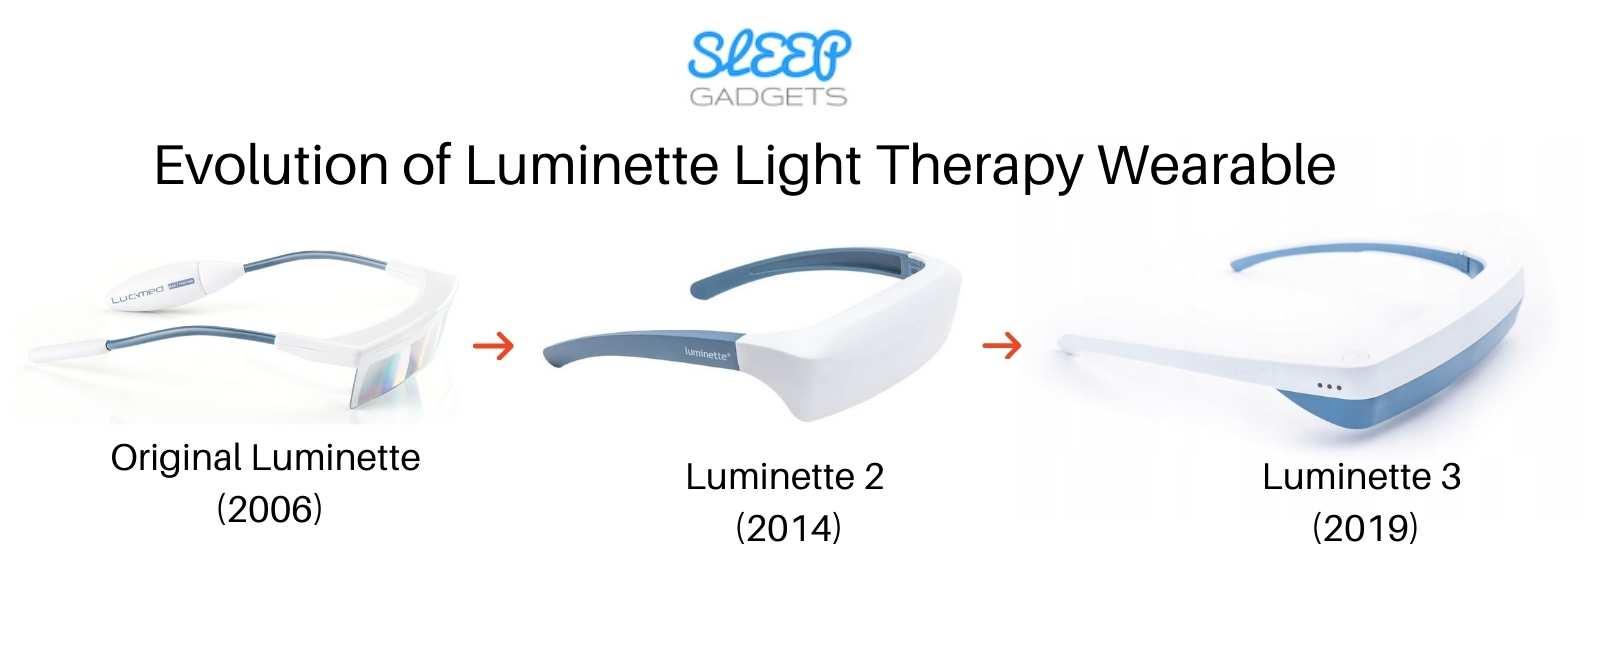 Comparing original Luminette 1, Luminette 2, new Luminette3